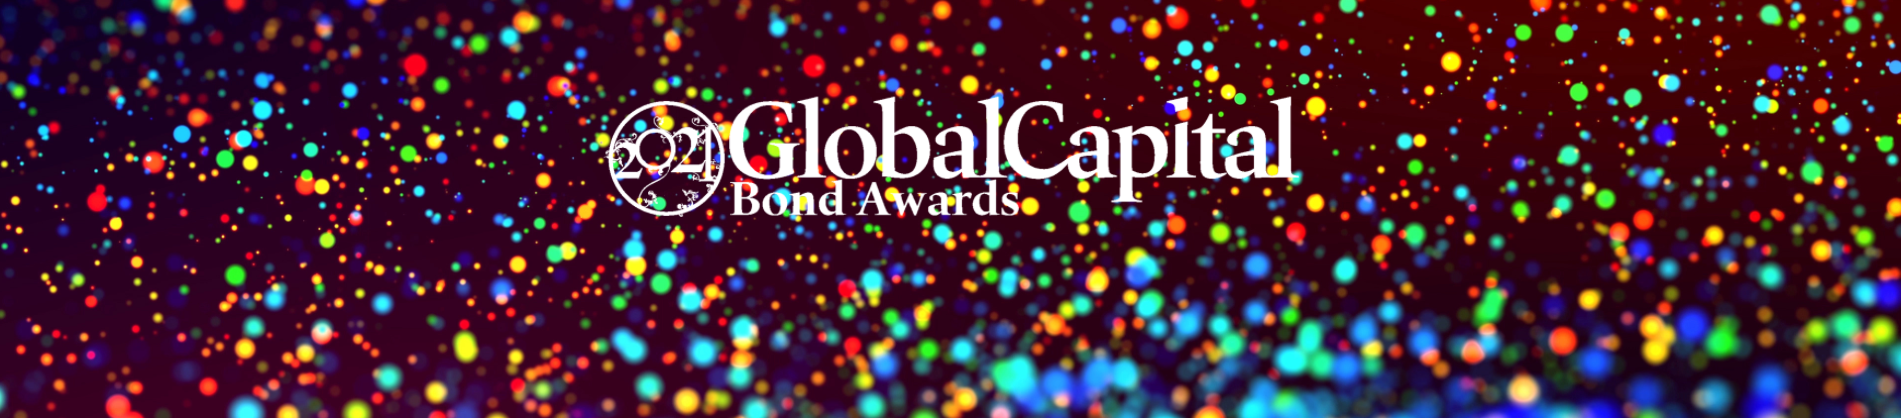 Bond Awards 2021